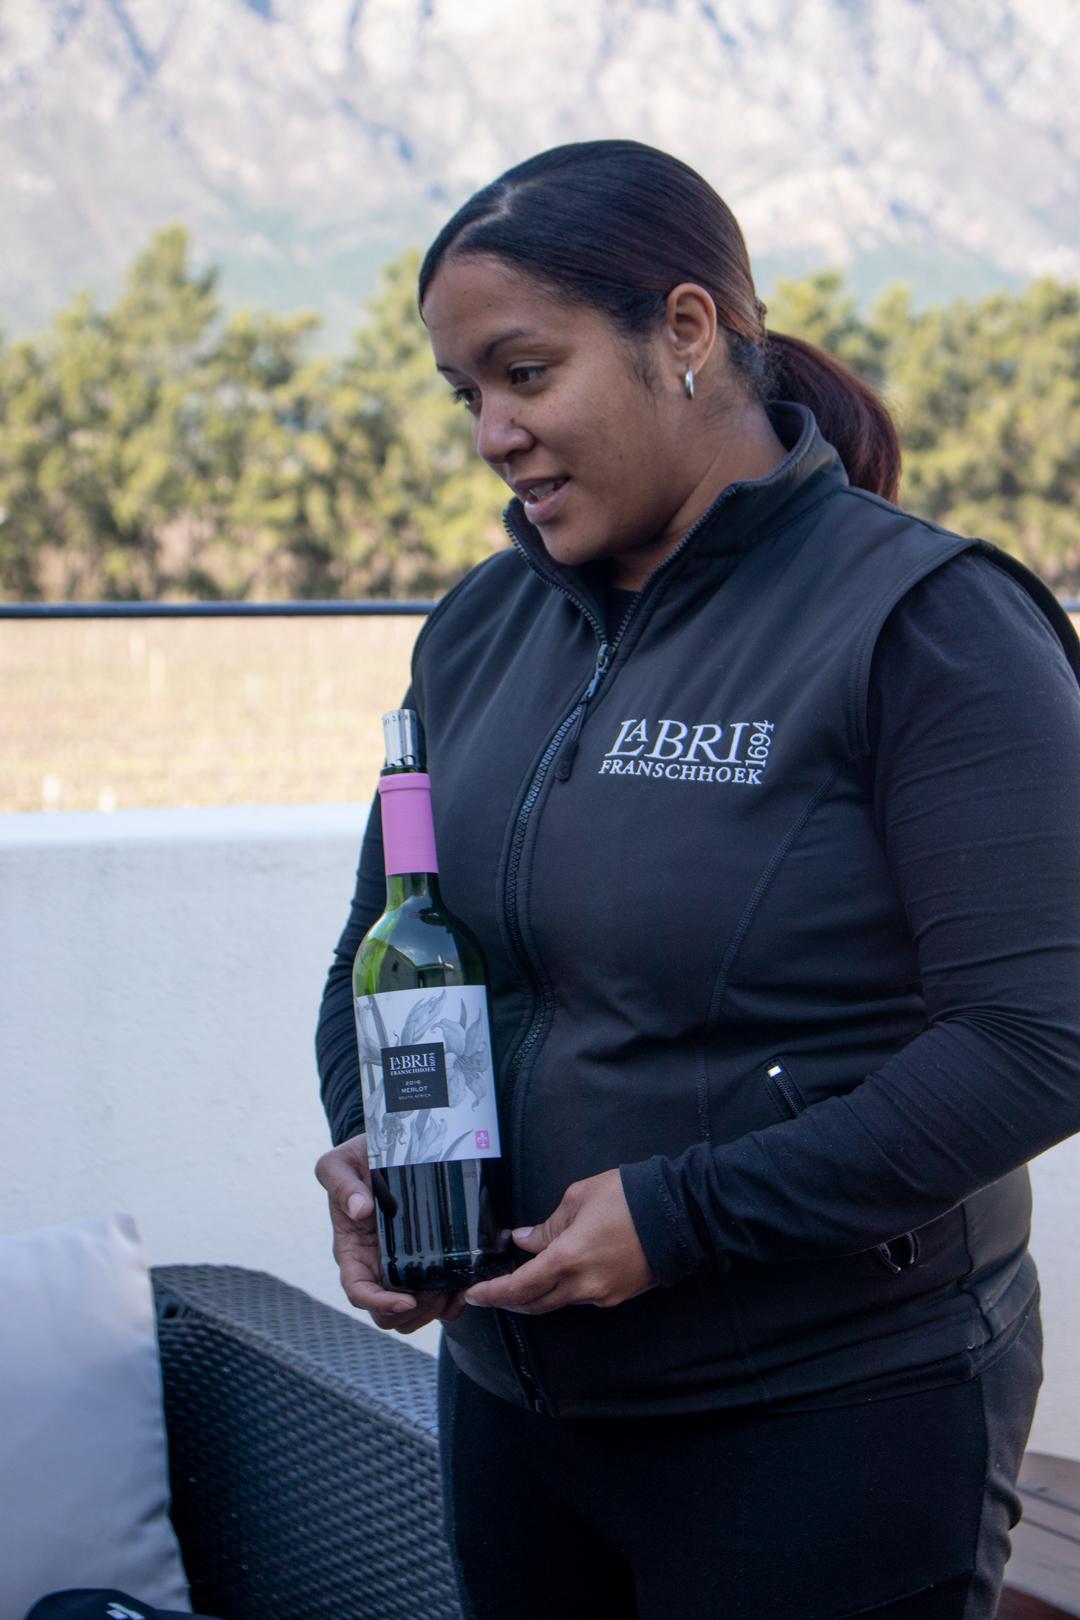 LaBri Wine Tasting & Cycle - Franschhoek, 21 July 2018 South Africa - by Ken Treloar Photography-60.jpg